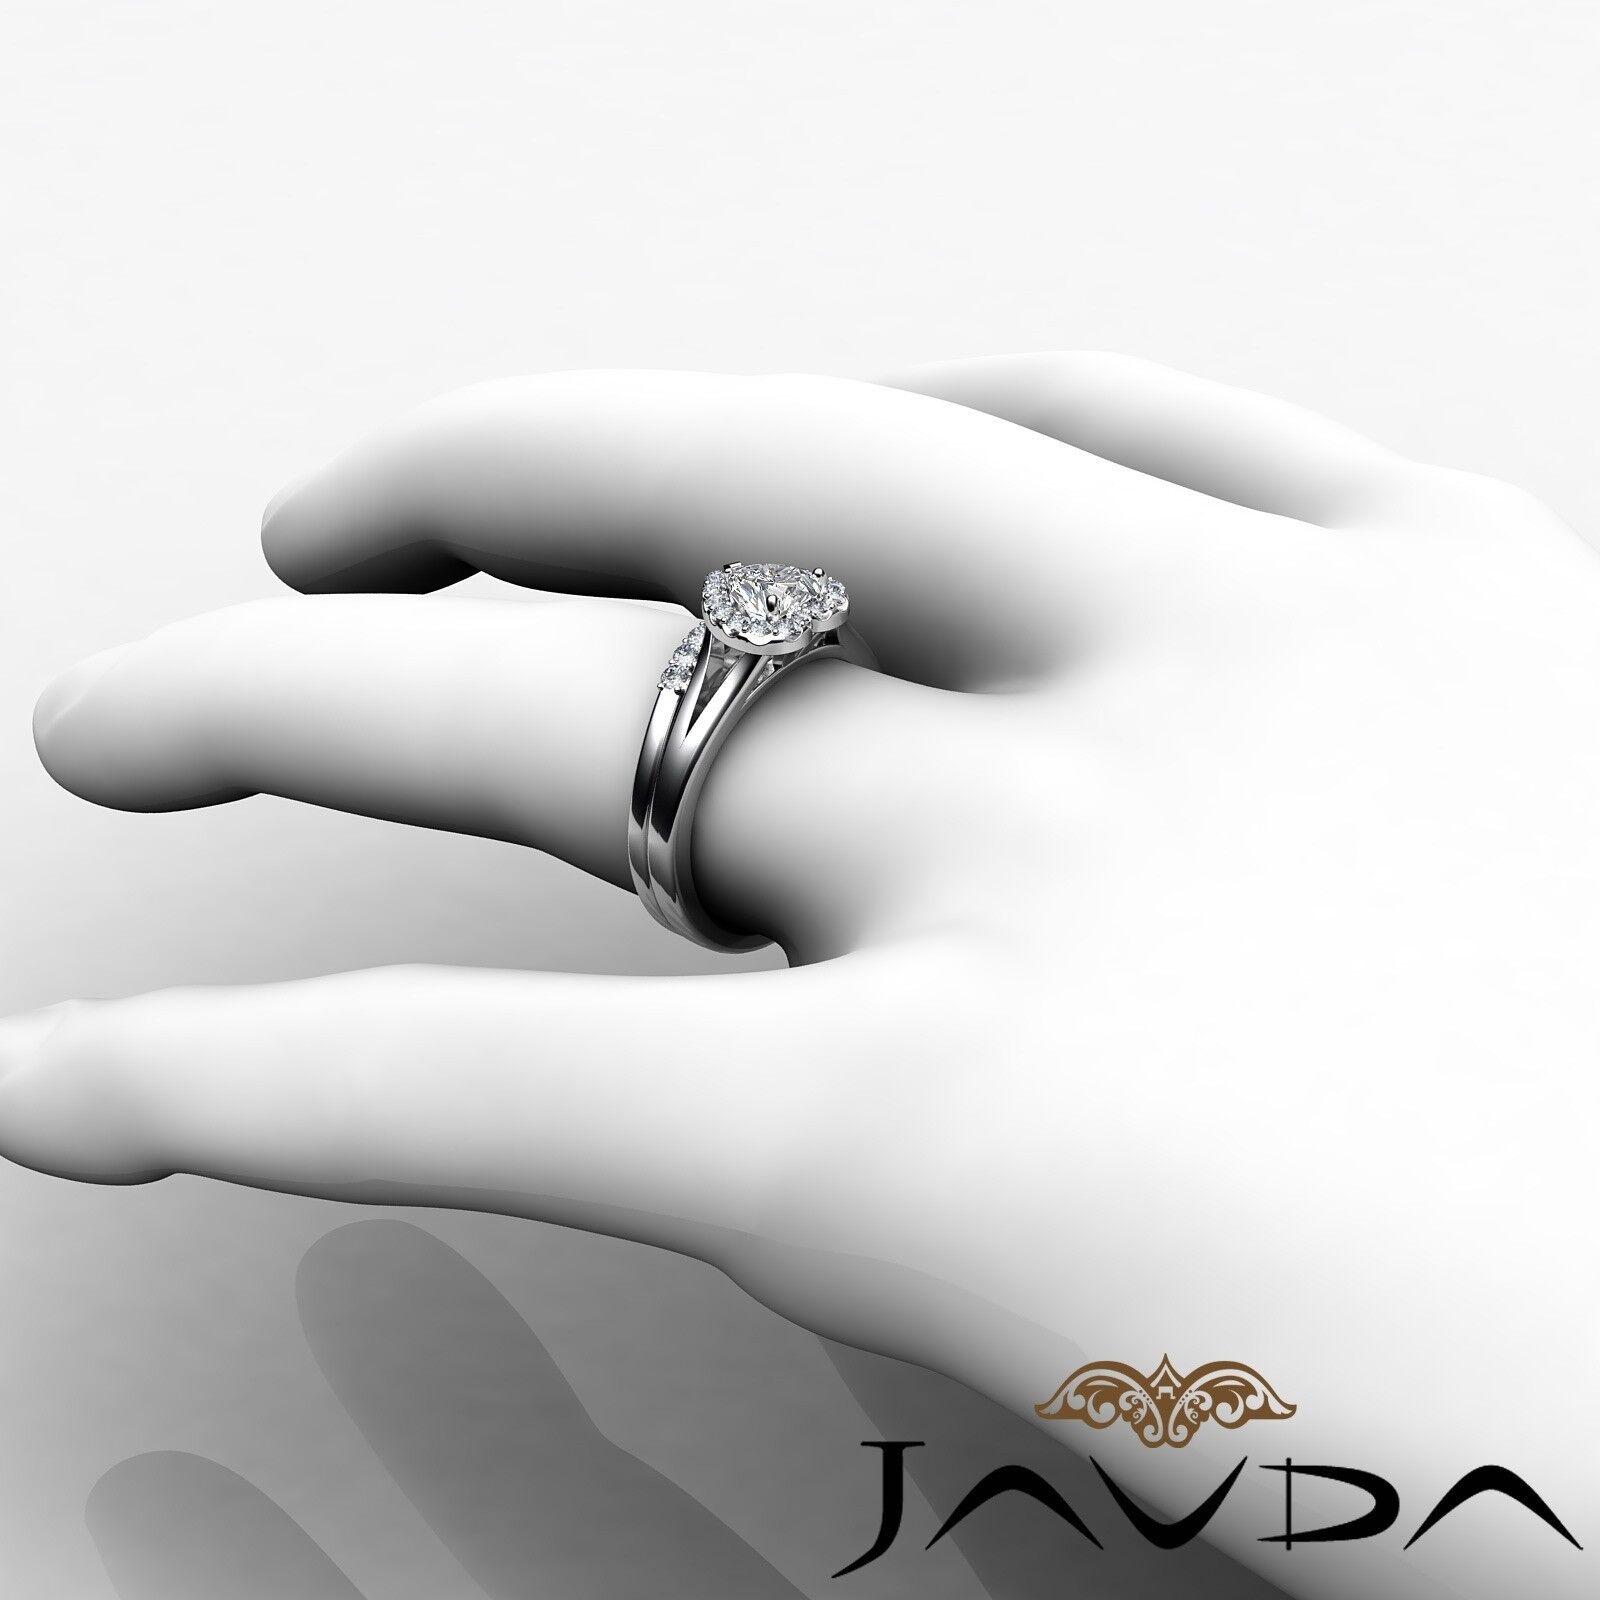 1.22ctw Pave Halo Bridal Set Heart Diamond Engagement Ring GIA G-VVS2 White Gold 5